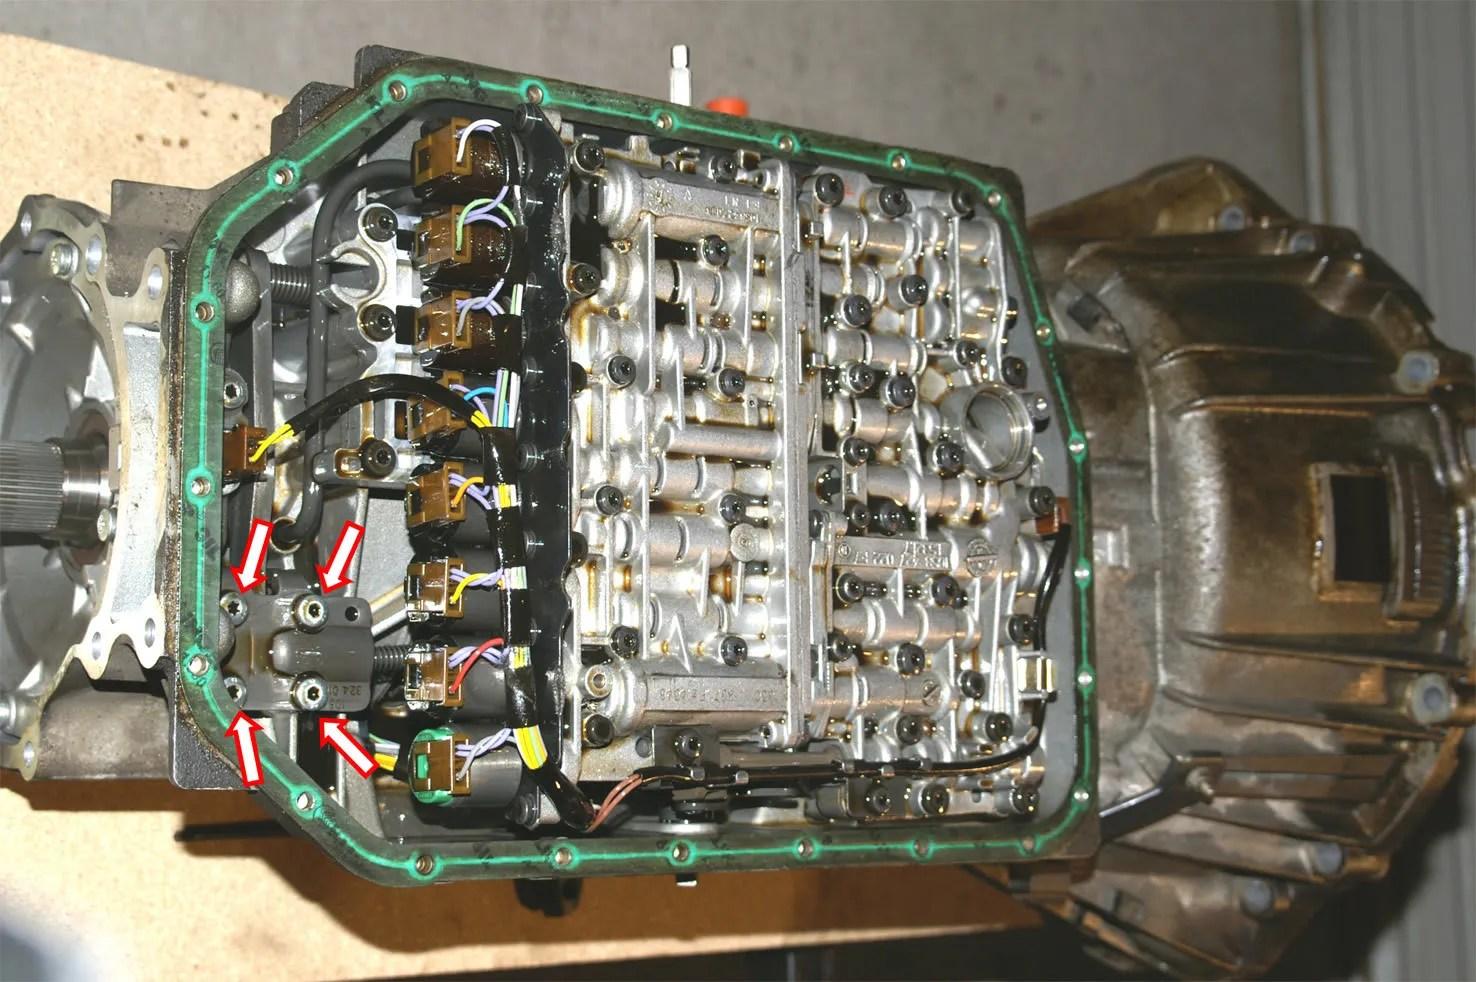 hight resolution of 2004 rr transmission problem and questions parklockrelease 2004 rr transmission problem and questions range rover p38 range rover p38 fuse box